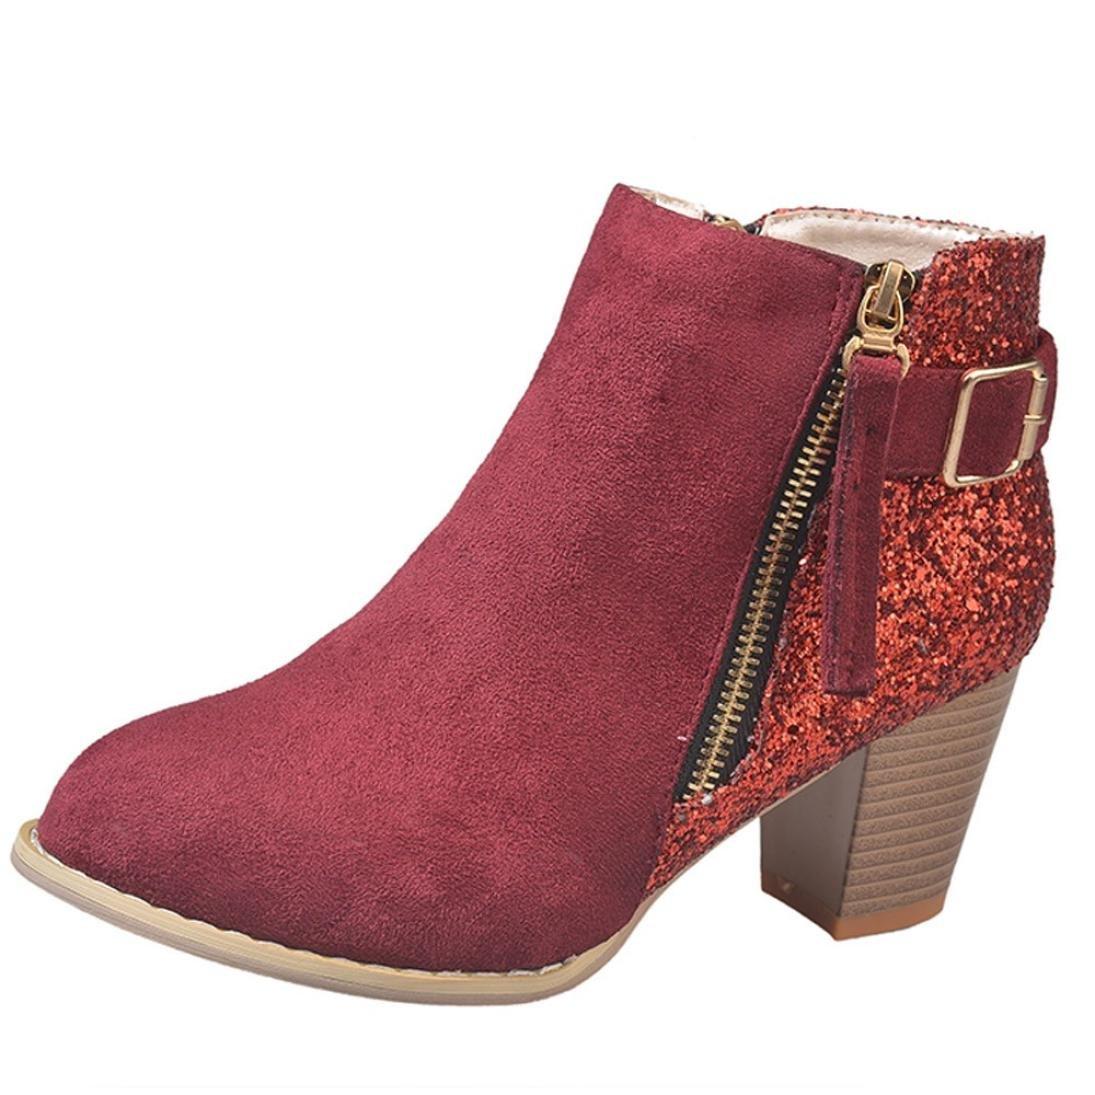 Amazon.com | Fheaven (TM) Women Round Toe High Ankle Boots Side Zipper Pactchwork Short Boots Short Boots Black | Ankle & Bootie